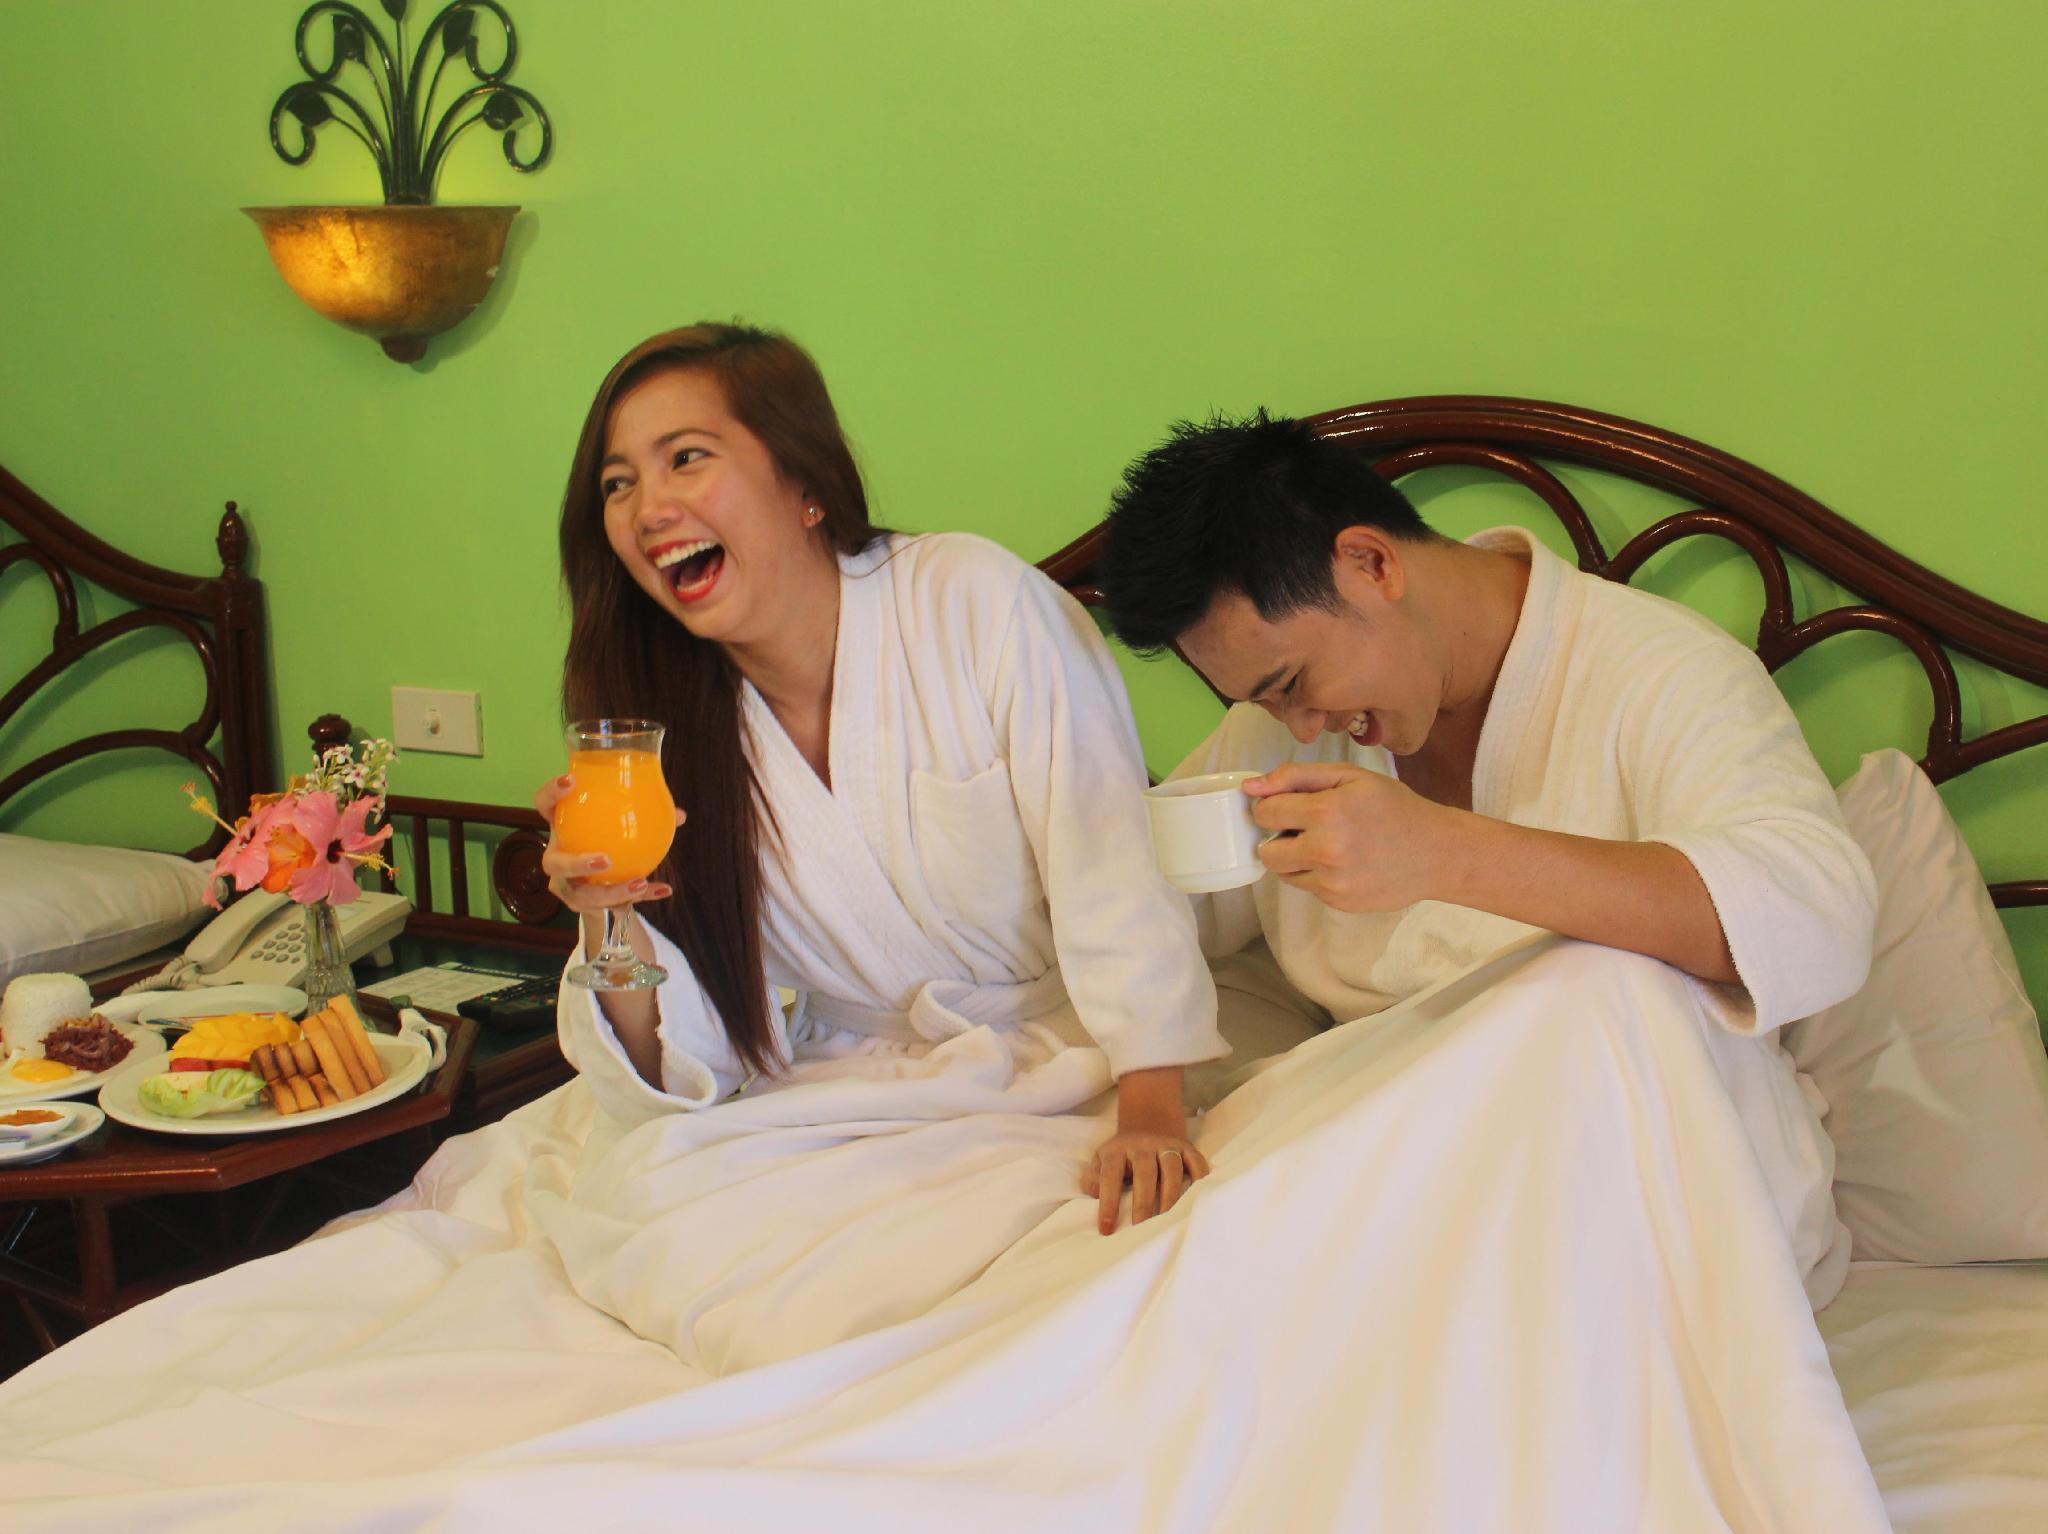 Cebu hookup cebu girls americans tv show